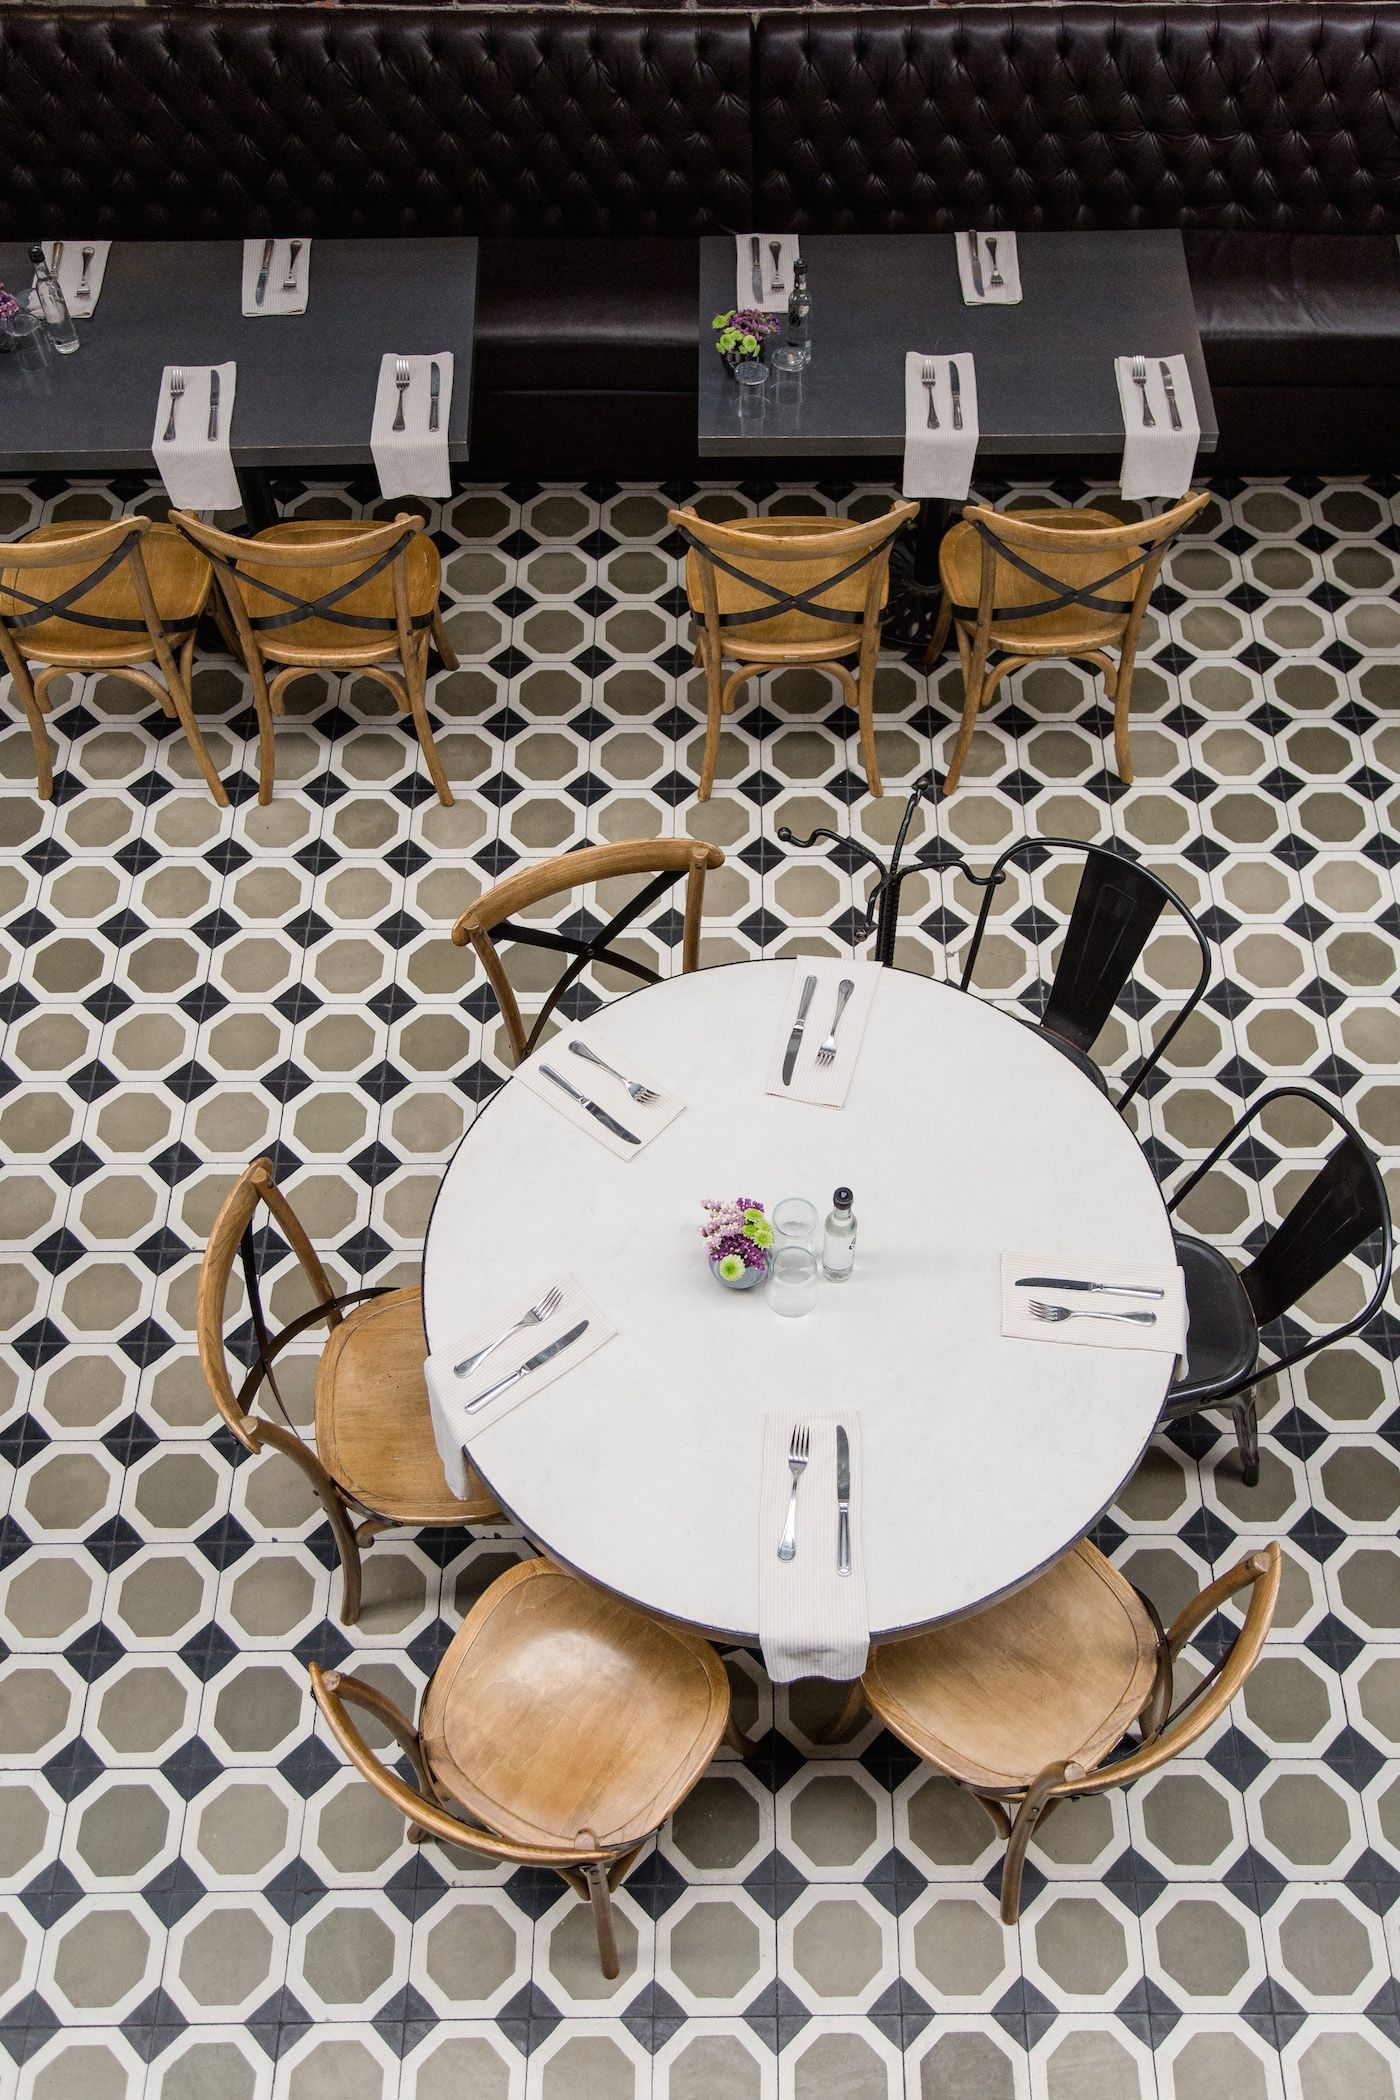 Franco Mexico restaurants, Tea lights, Tea light candle